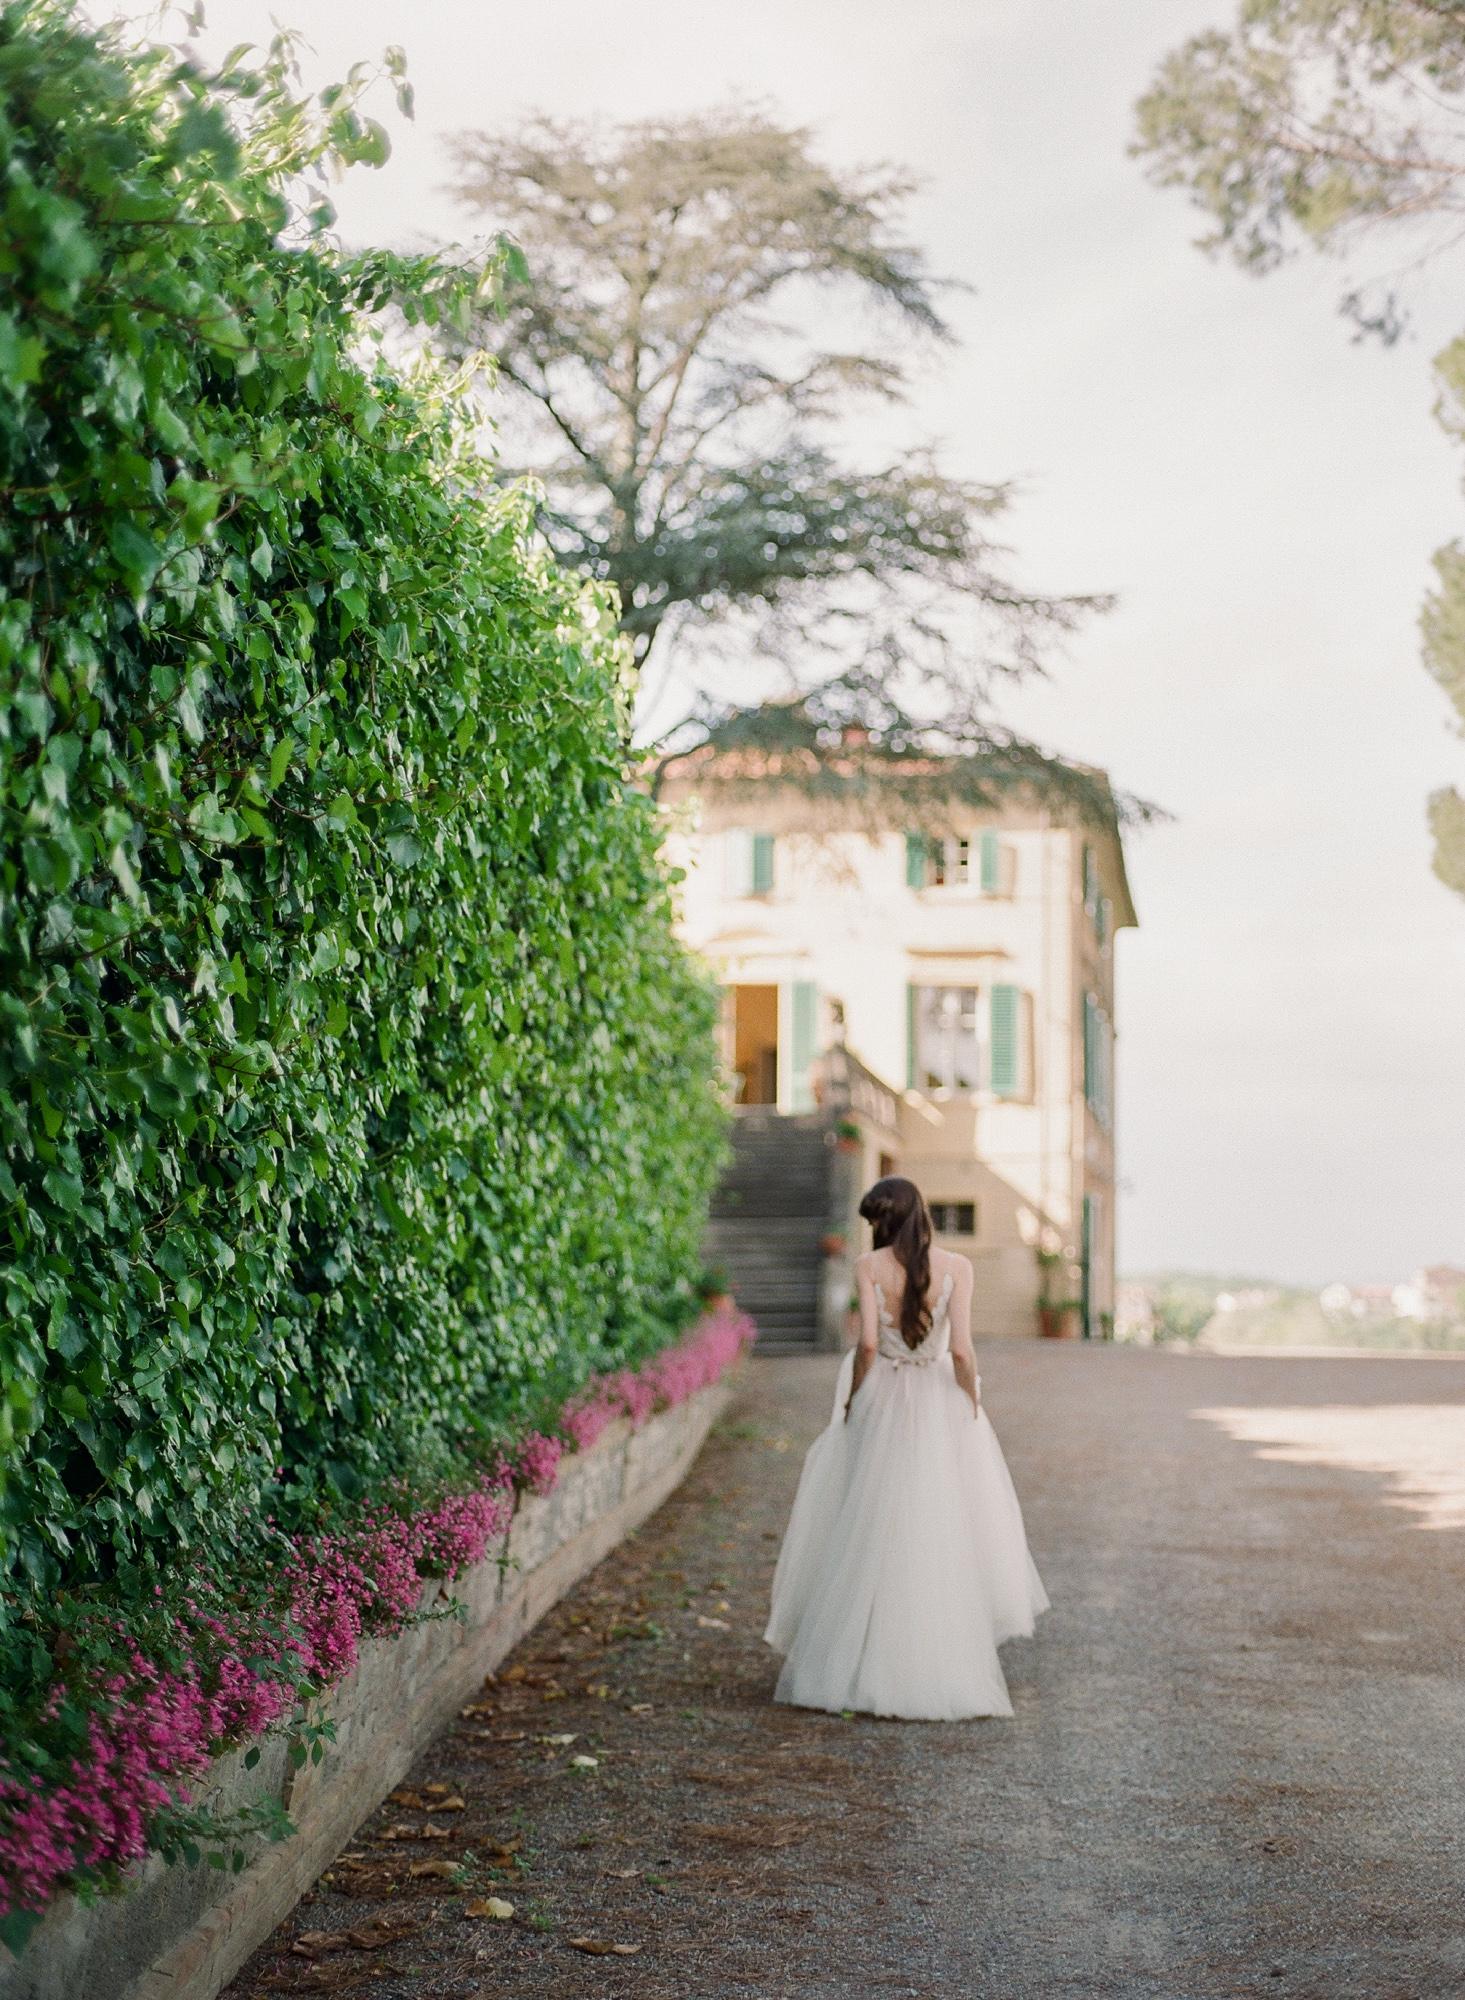 Tuscany-Wedding-Venues-12.jpg